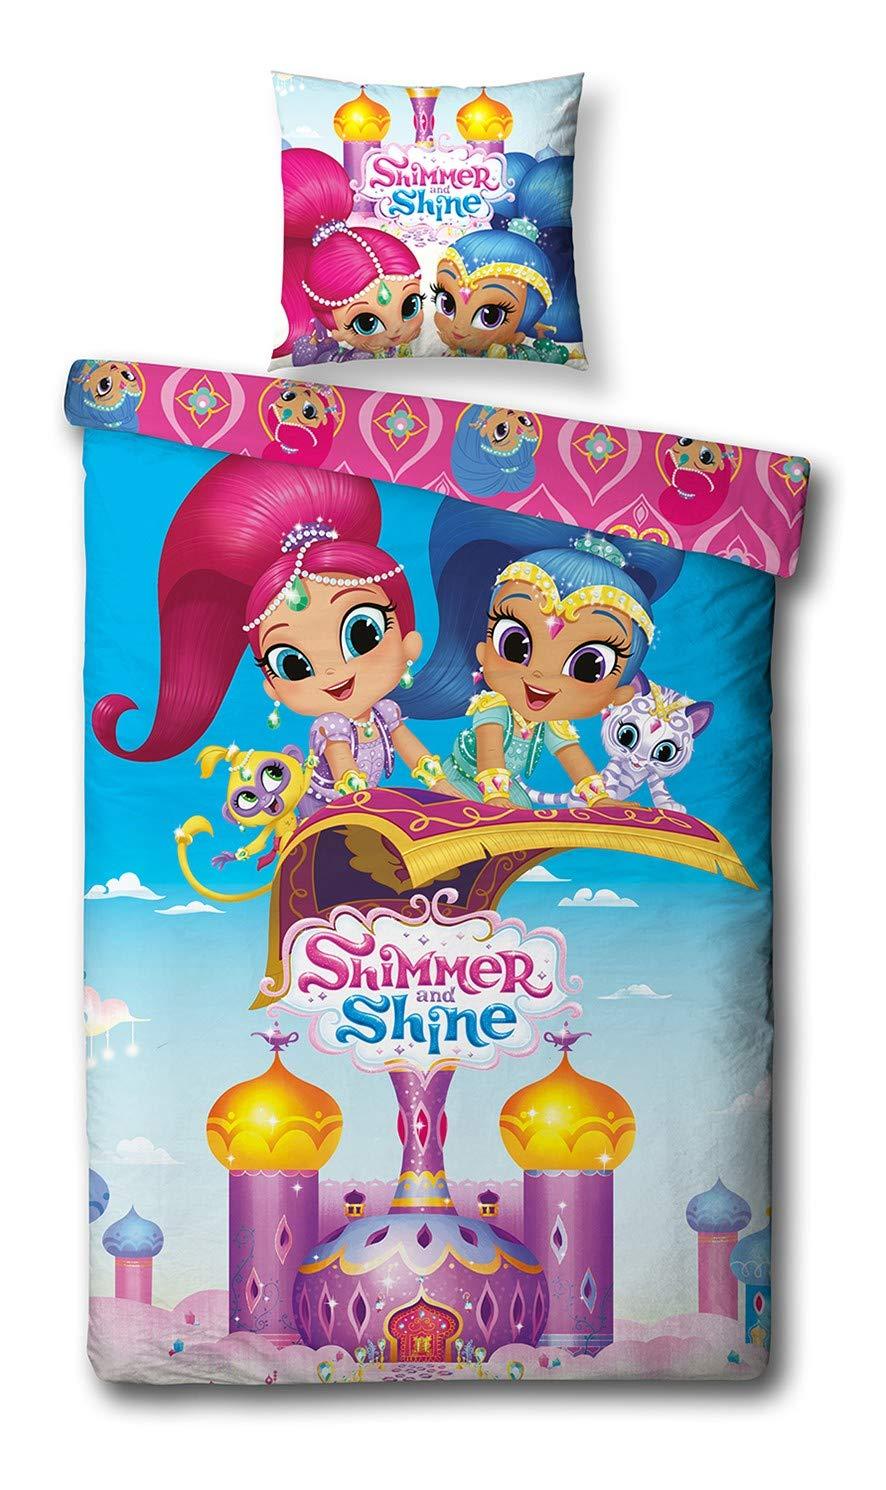 Amazon.com: Nickelodeon Shimmer and Shine - Juego de funda ...